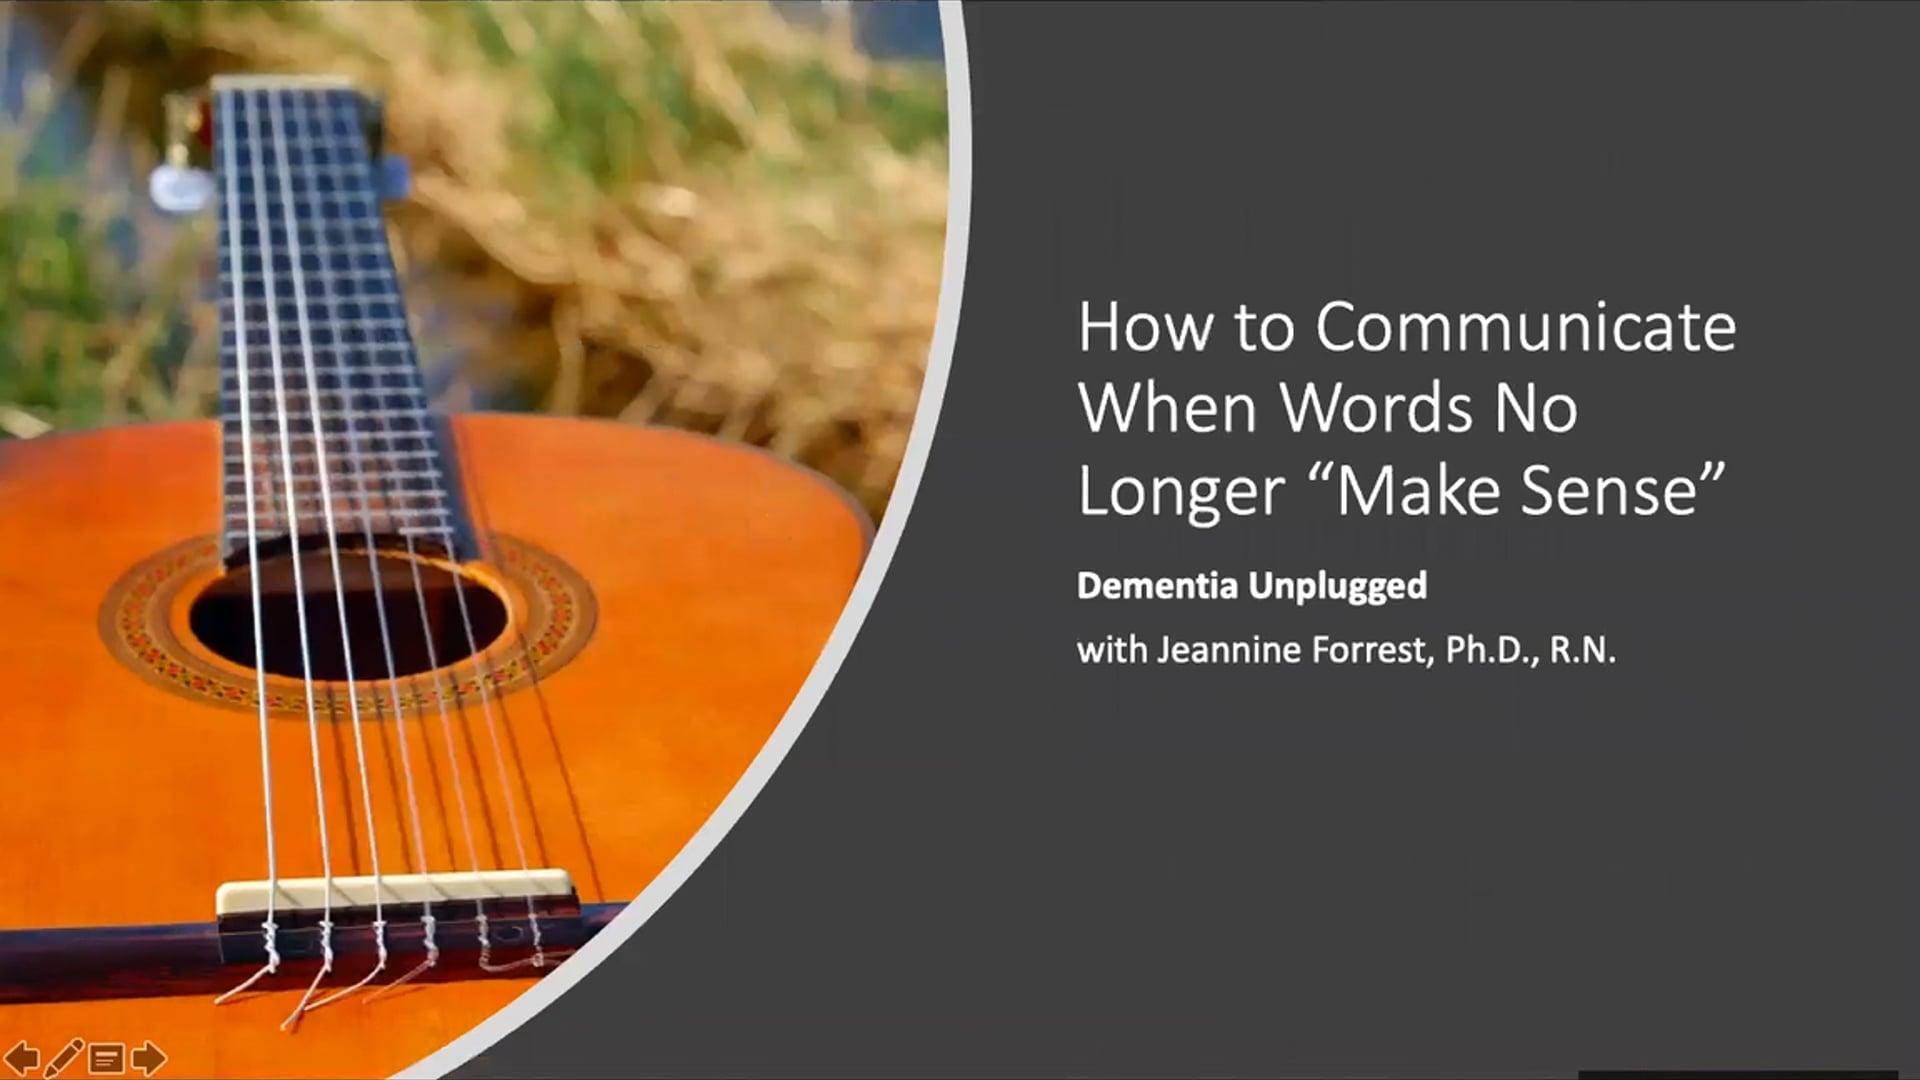 How to Communicate When Words No Longer Make Sense